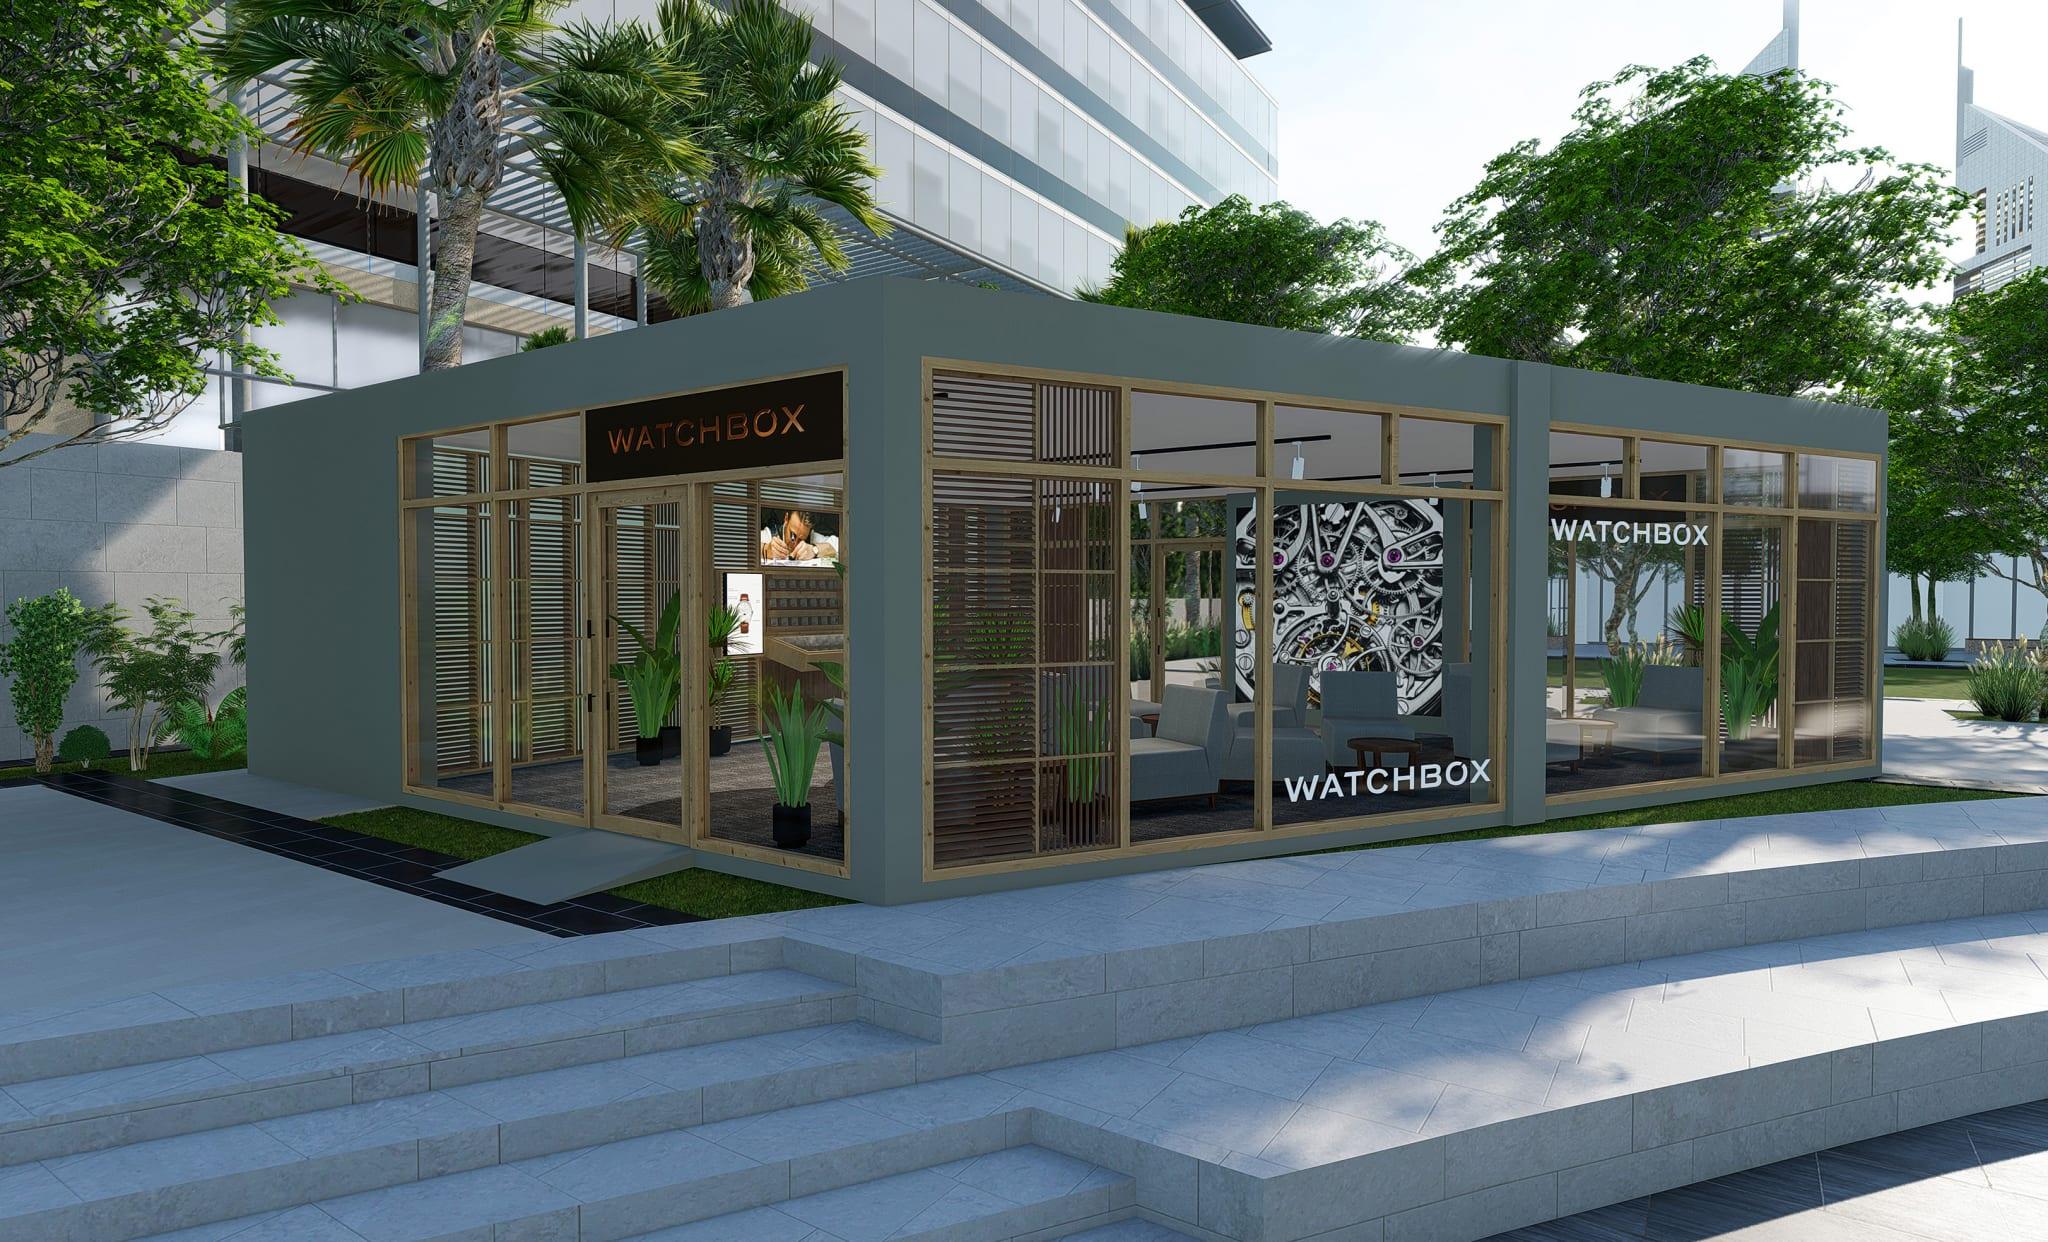 Watchbox Dubai